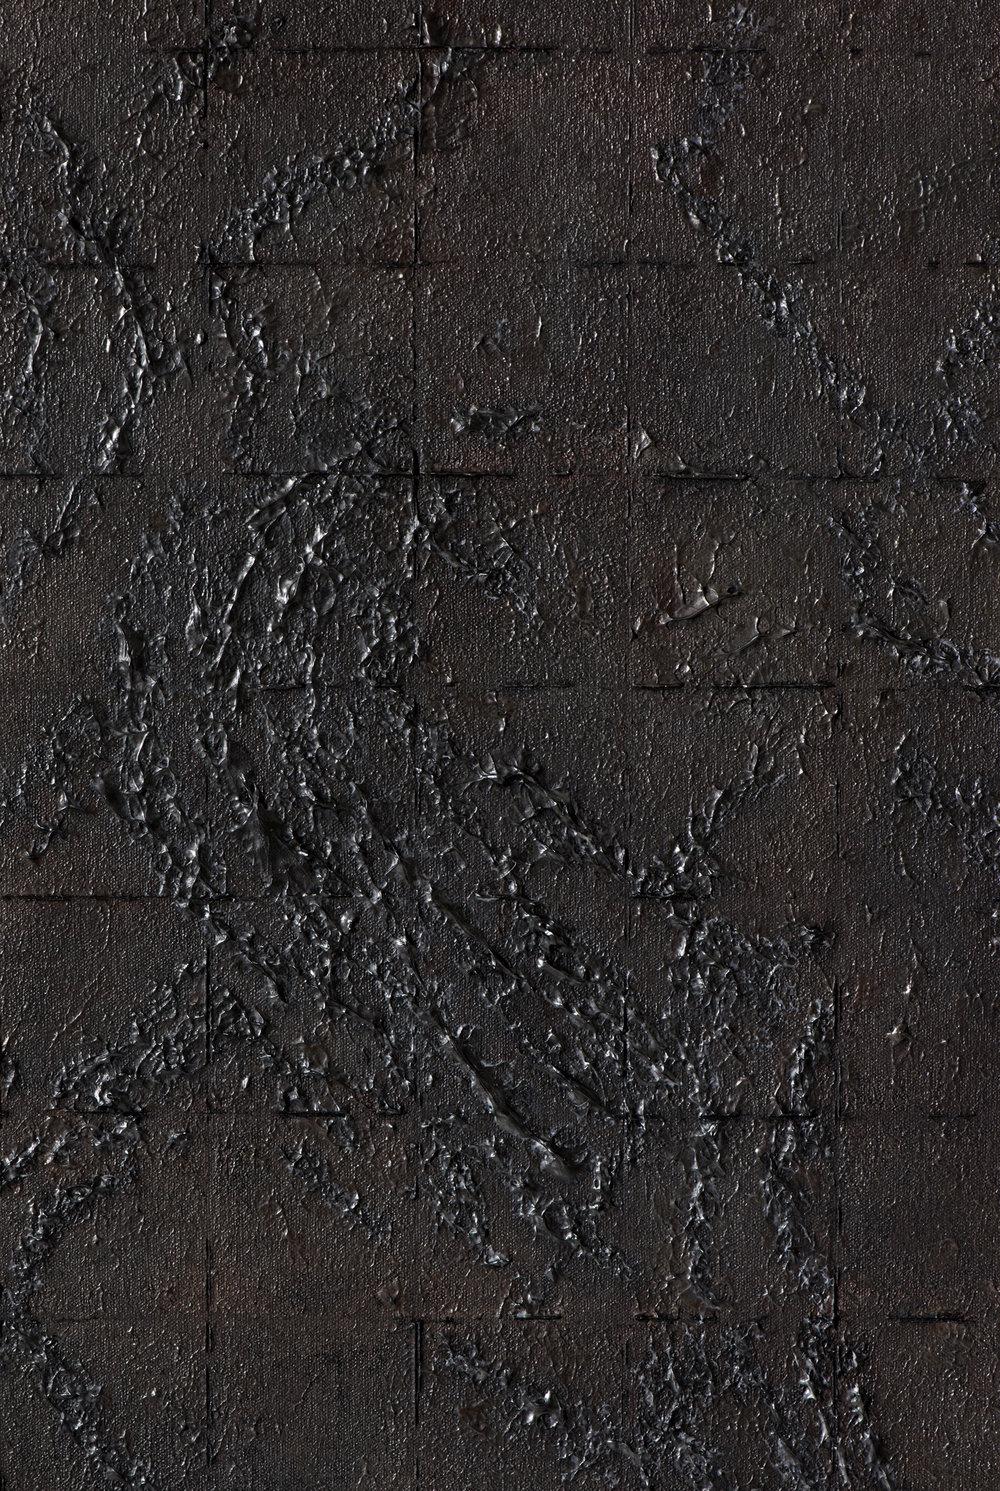 DarkTopography1_detail_DSC2822.jpg